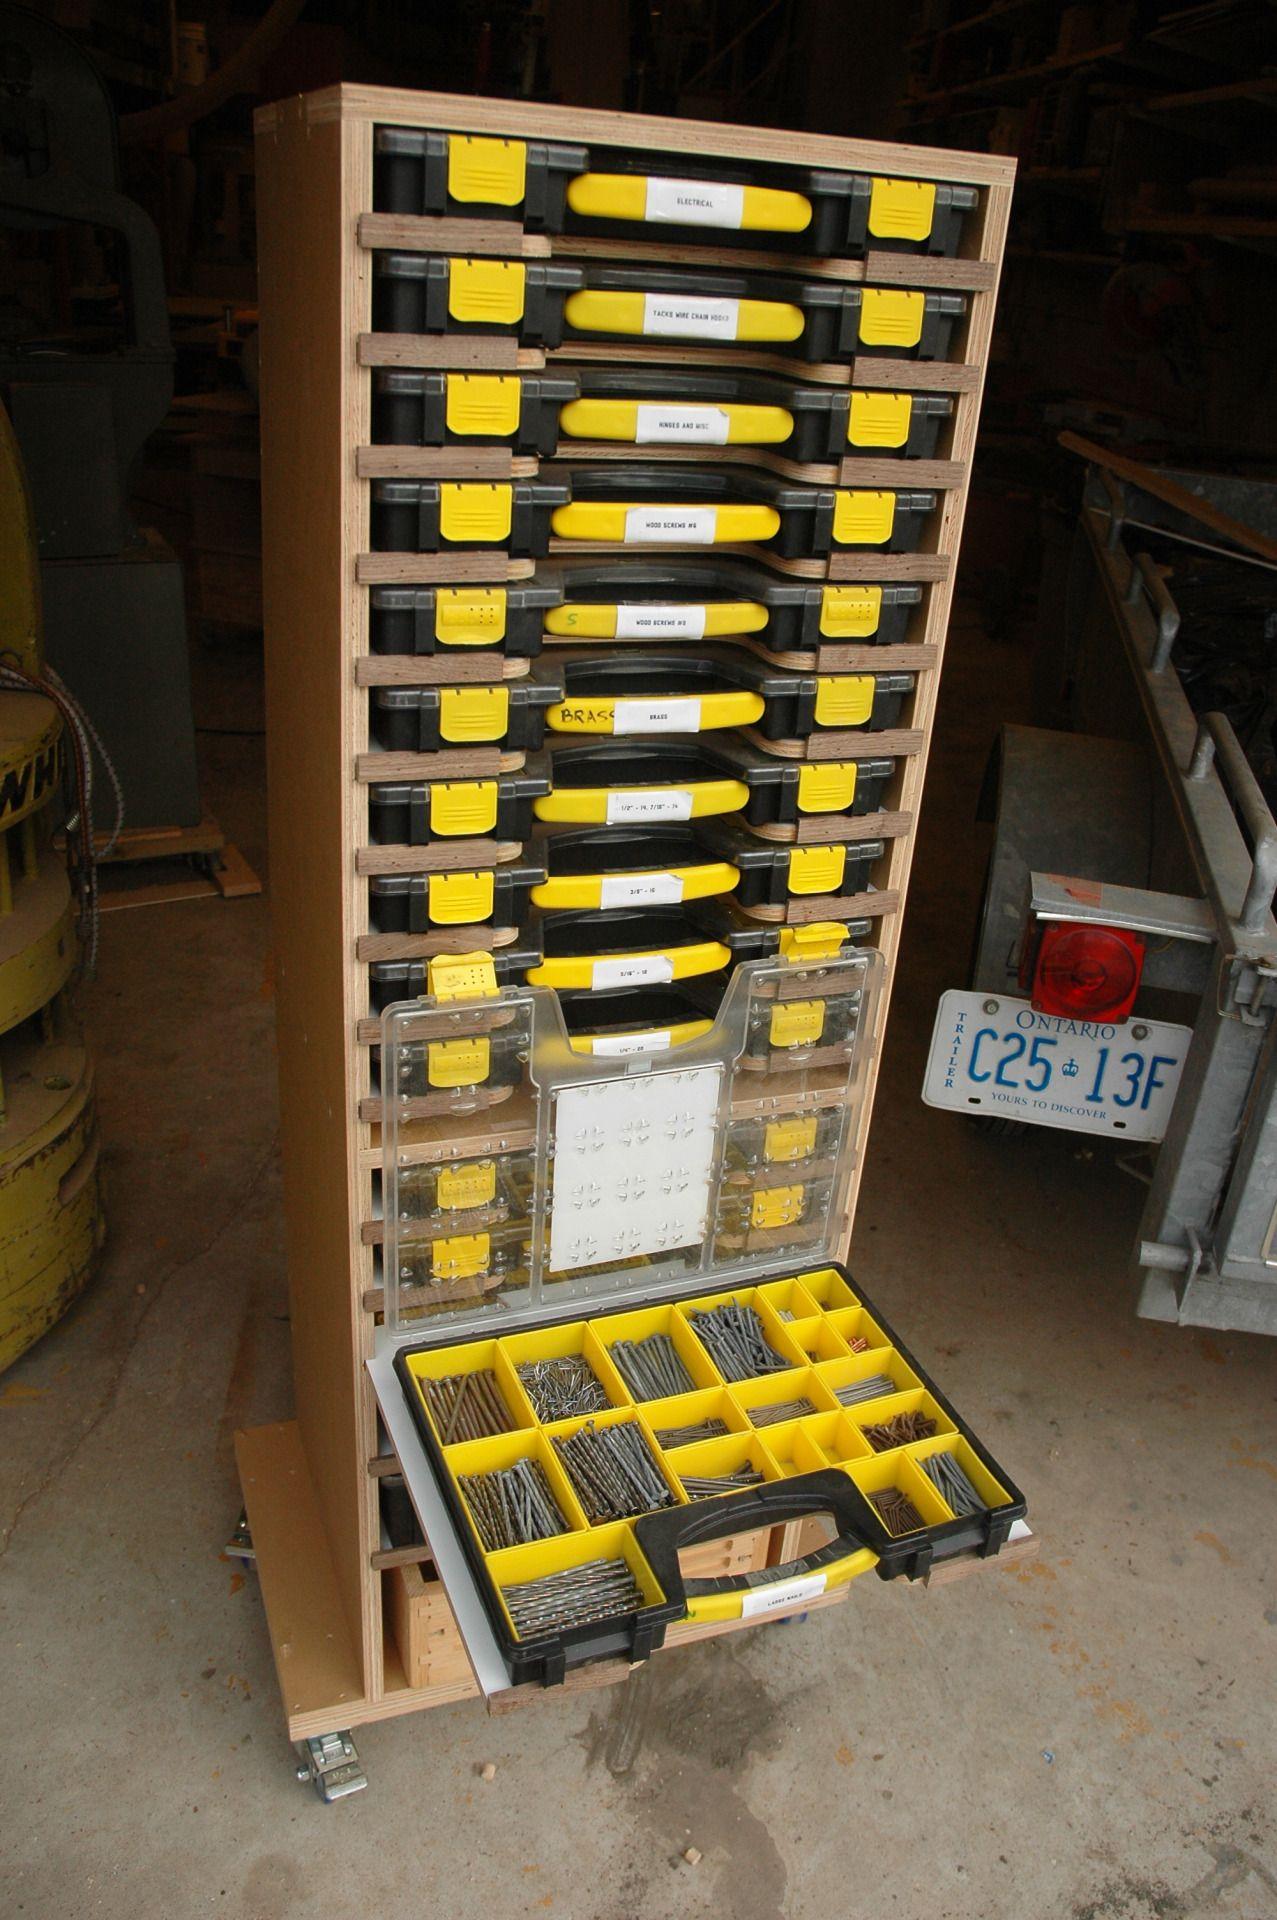 Mobile Modular Small Parts Rack Inexpensive Adam Savage Style  # Muebles Sortimo